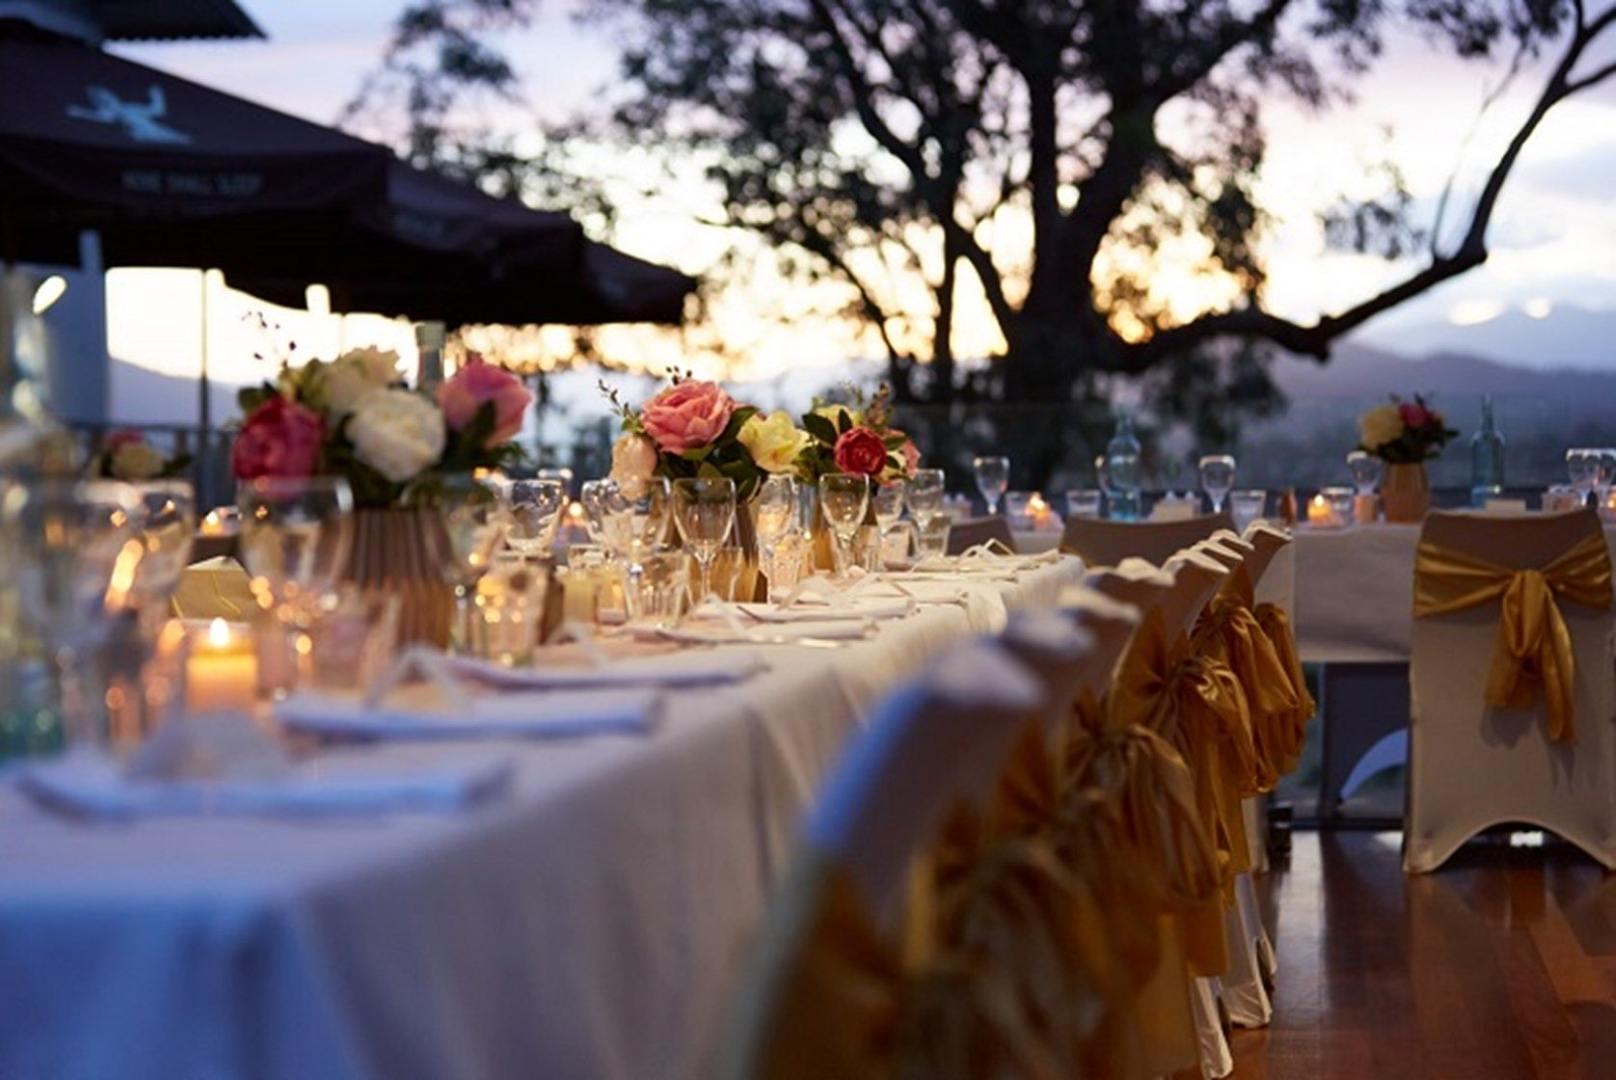 Wedding Venue - Tweed Gallery Cafe 11 on Veilability